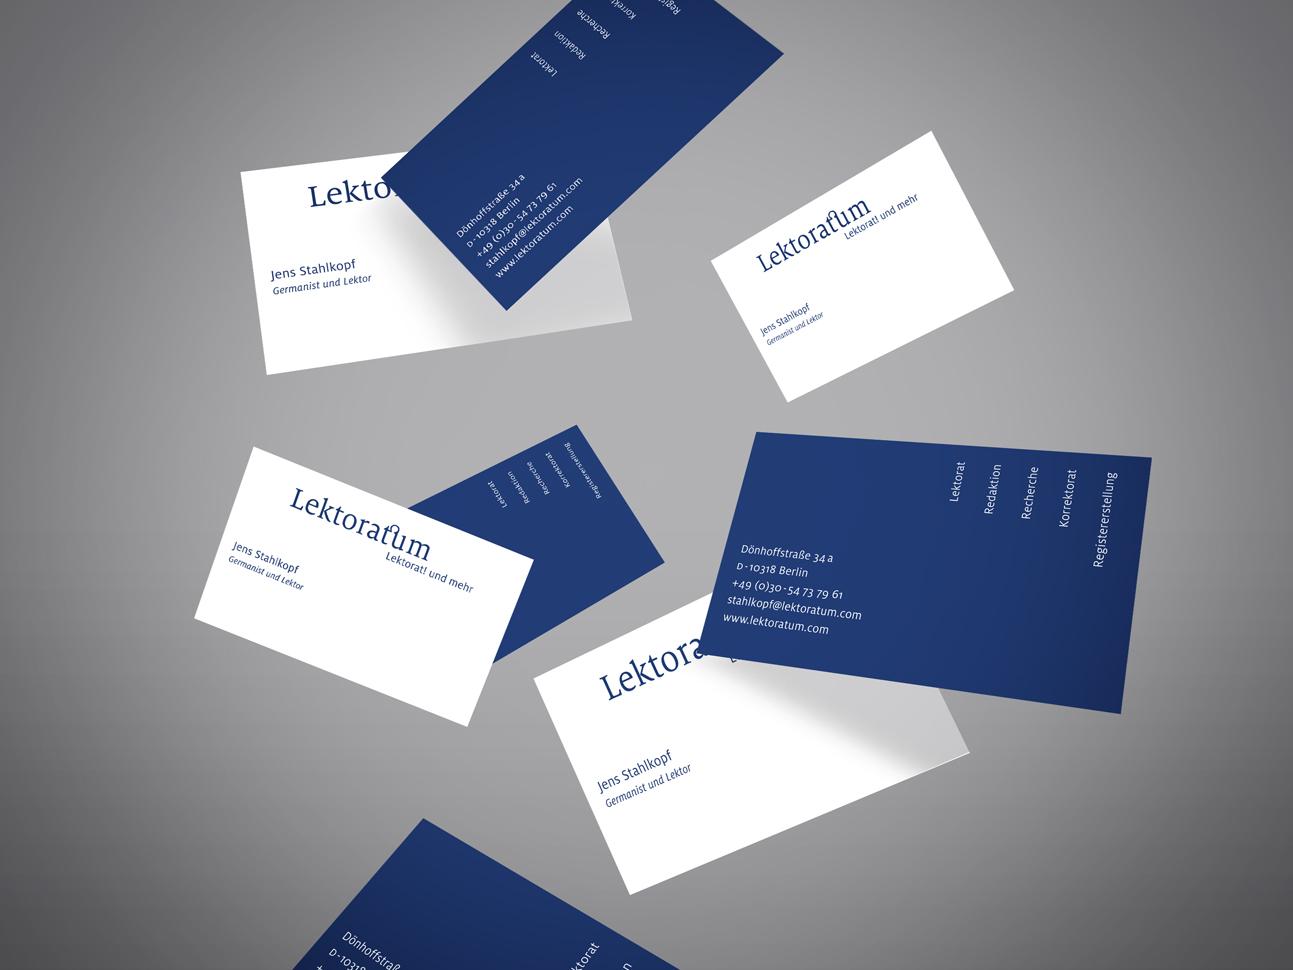 martin_zech_design_corporate_design_lektoratum_visitenkarte